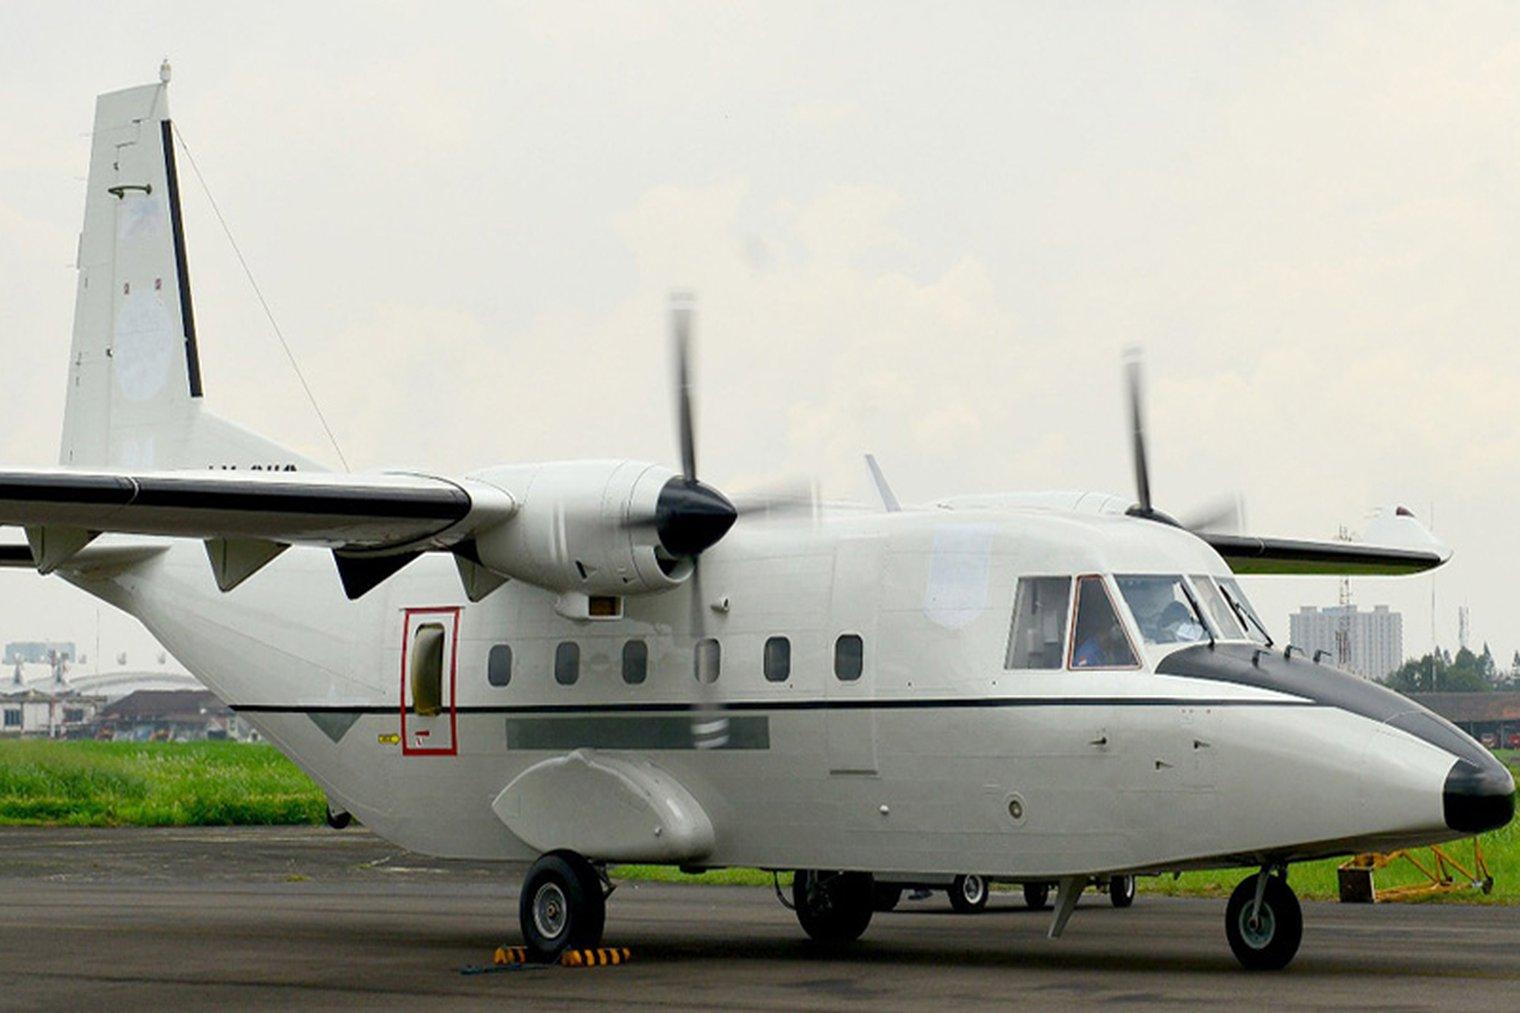 Indonesian Air Force awaits NC212i aircraft